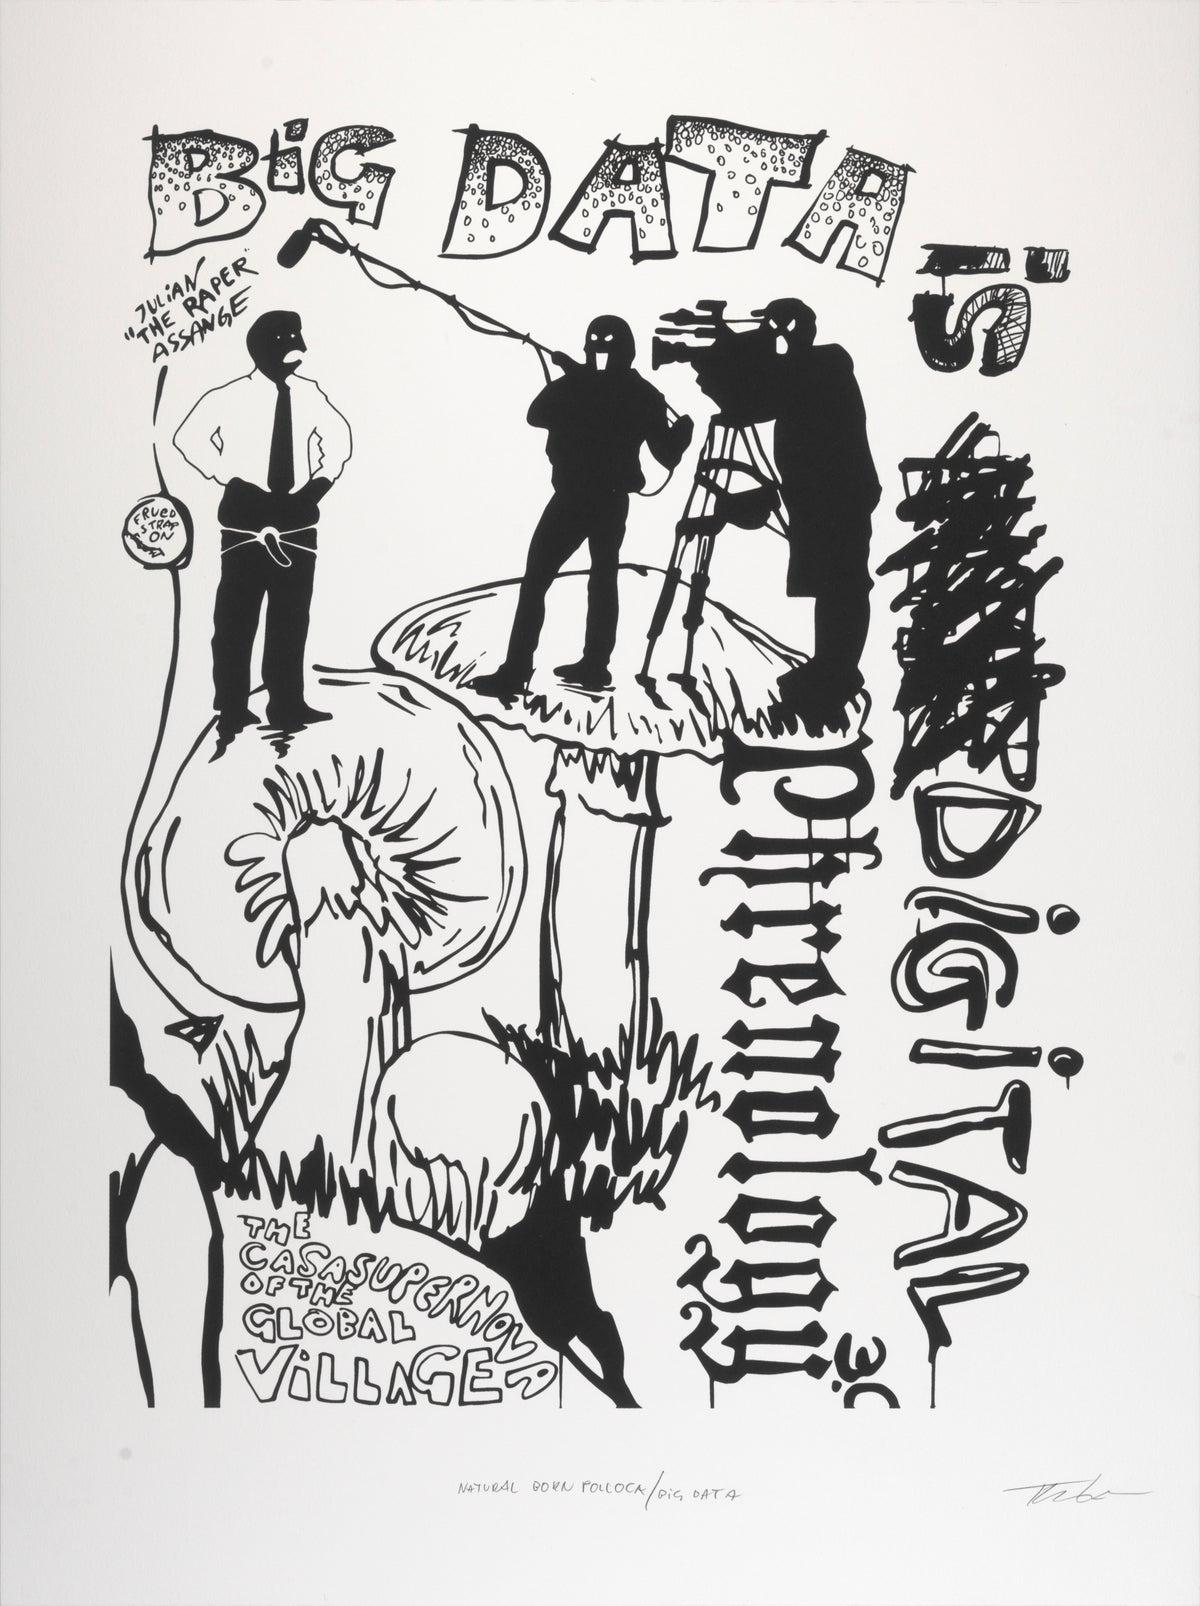 Image of Natural Born Pollock / Big Data